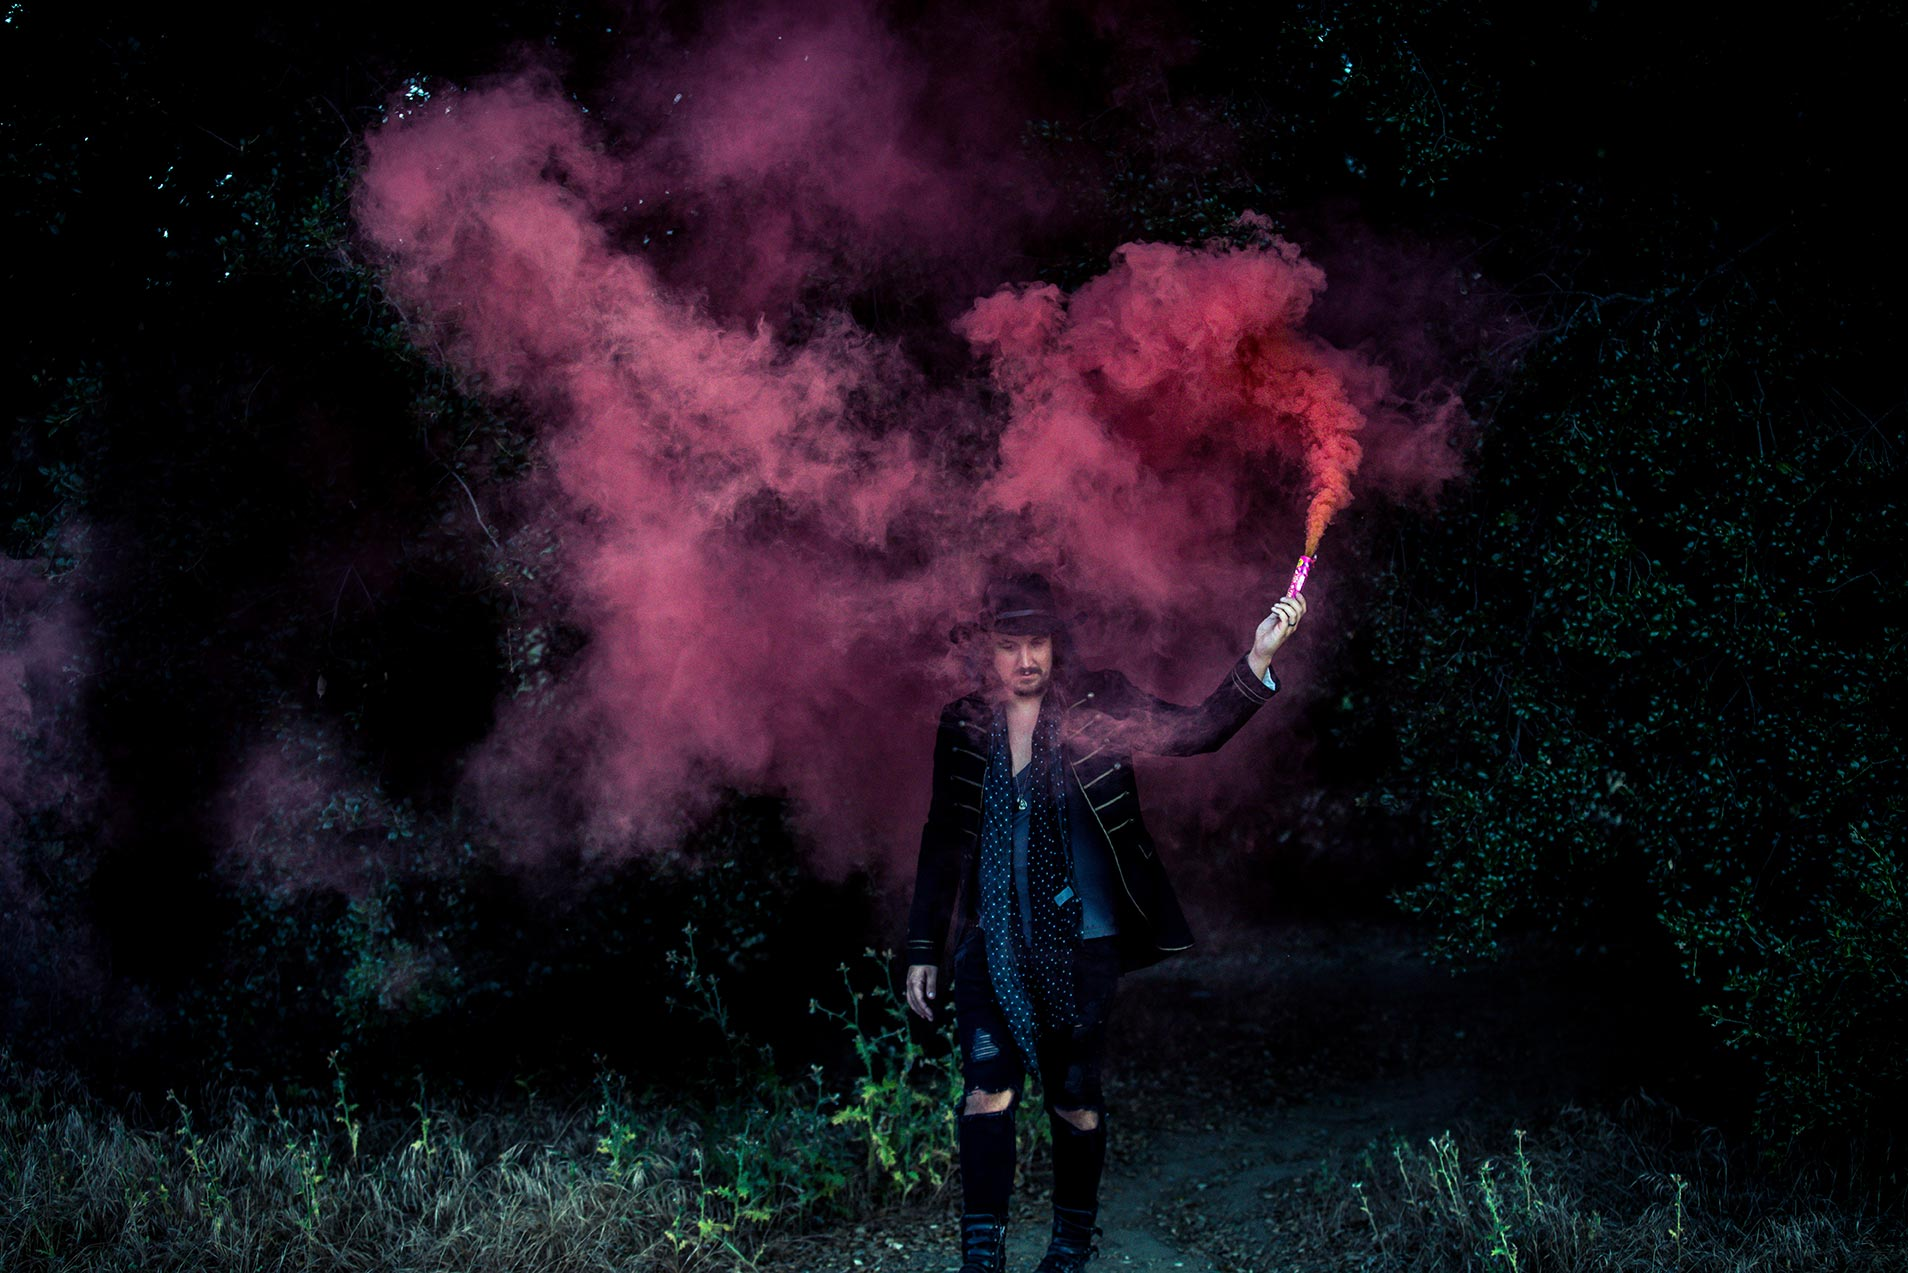 Tim-Myers-New-Photo-Shoot-21-copy.jpg